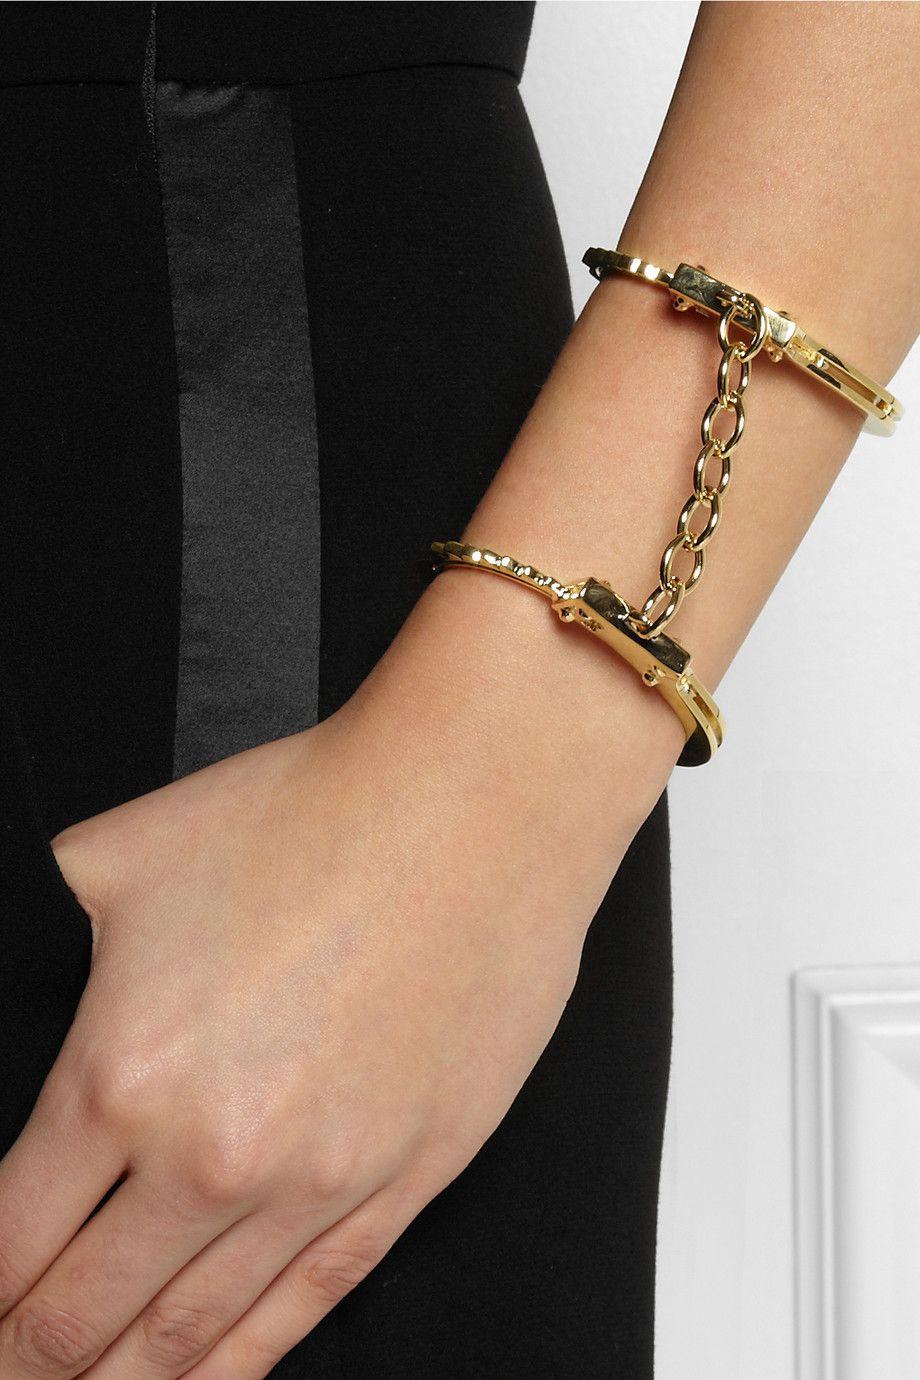 1fee7d3d1 #WISHLIST ~~ Jennifer Fisher | Handcuff gold-plated double cuff |  NET-A-PORTER.COM